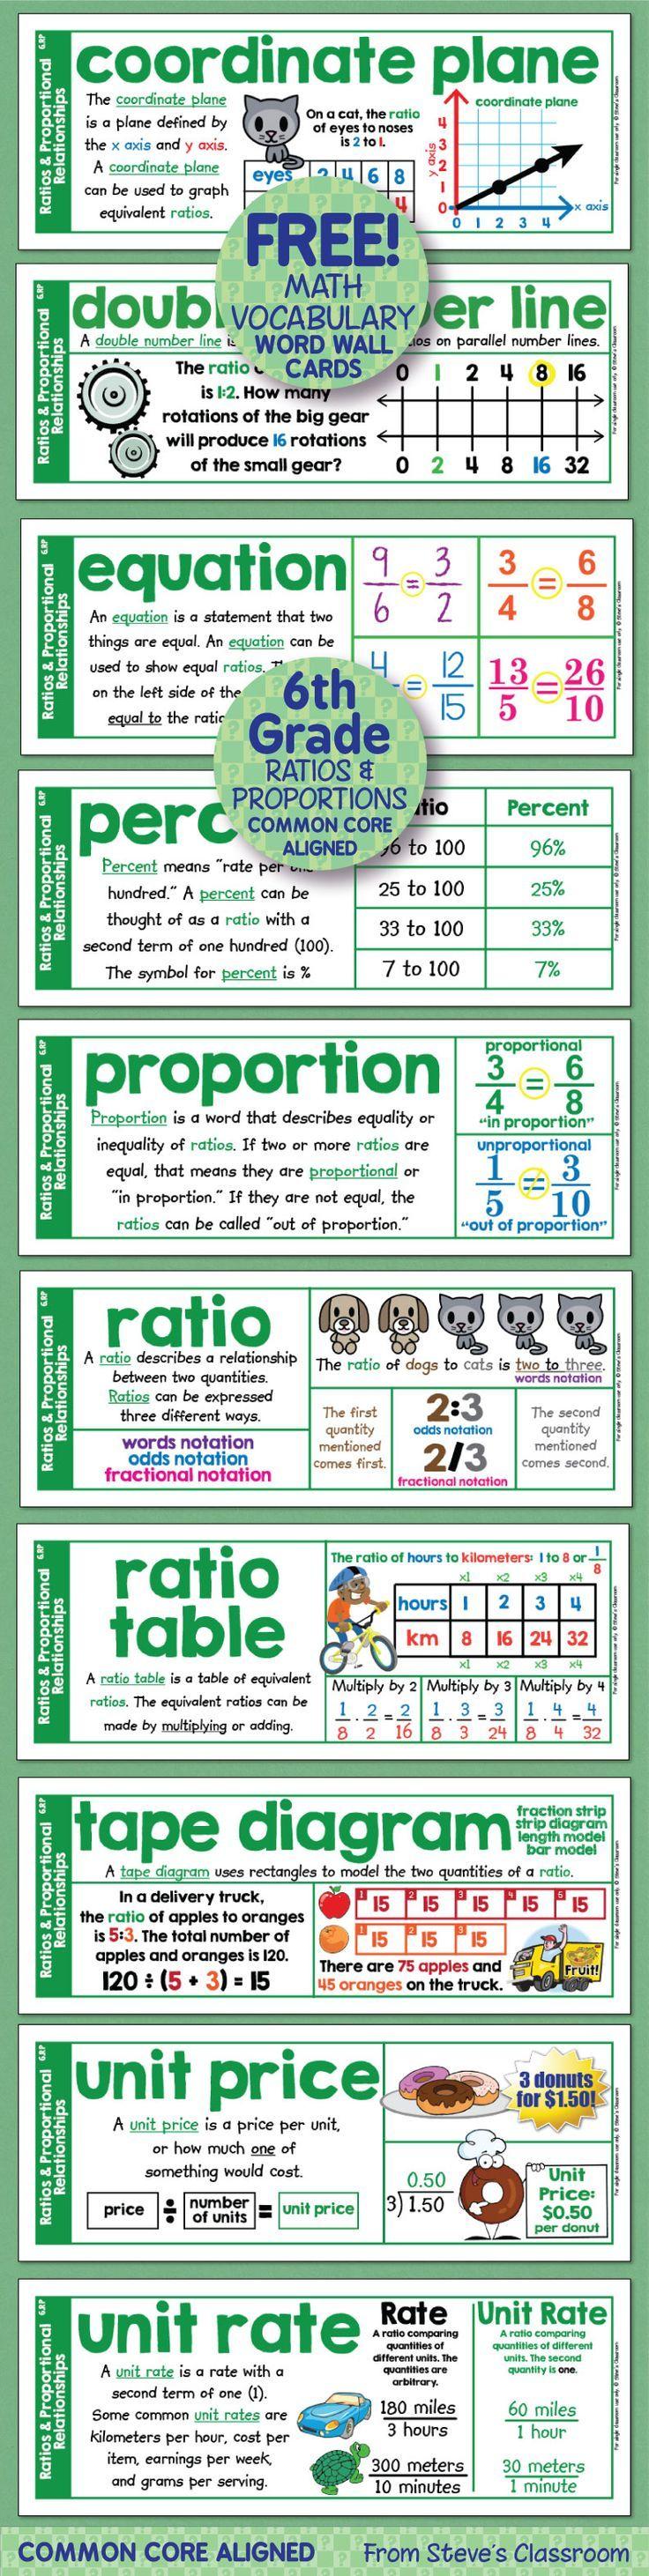 Best casinos online 6th grade math : Play free casino slots games ...